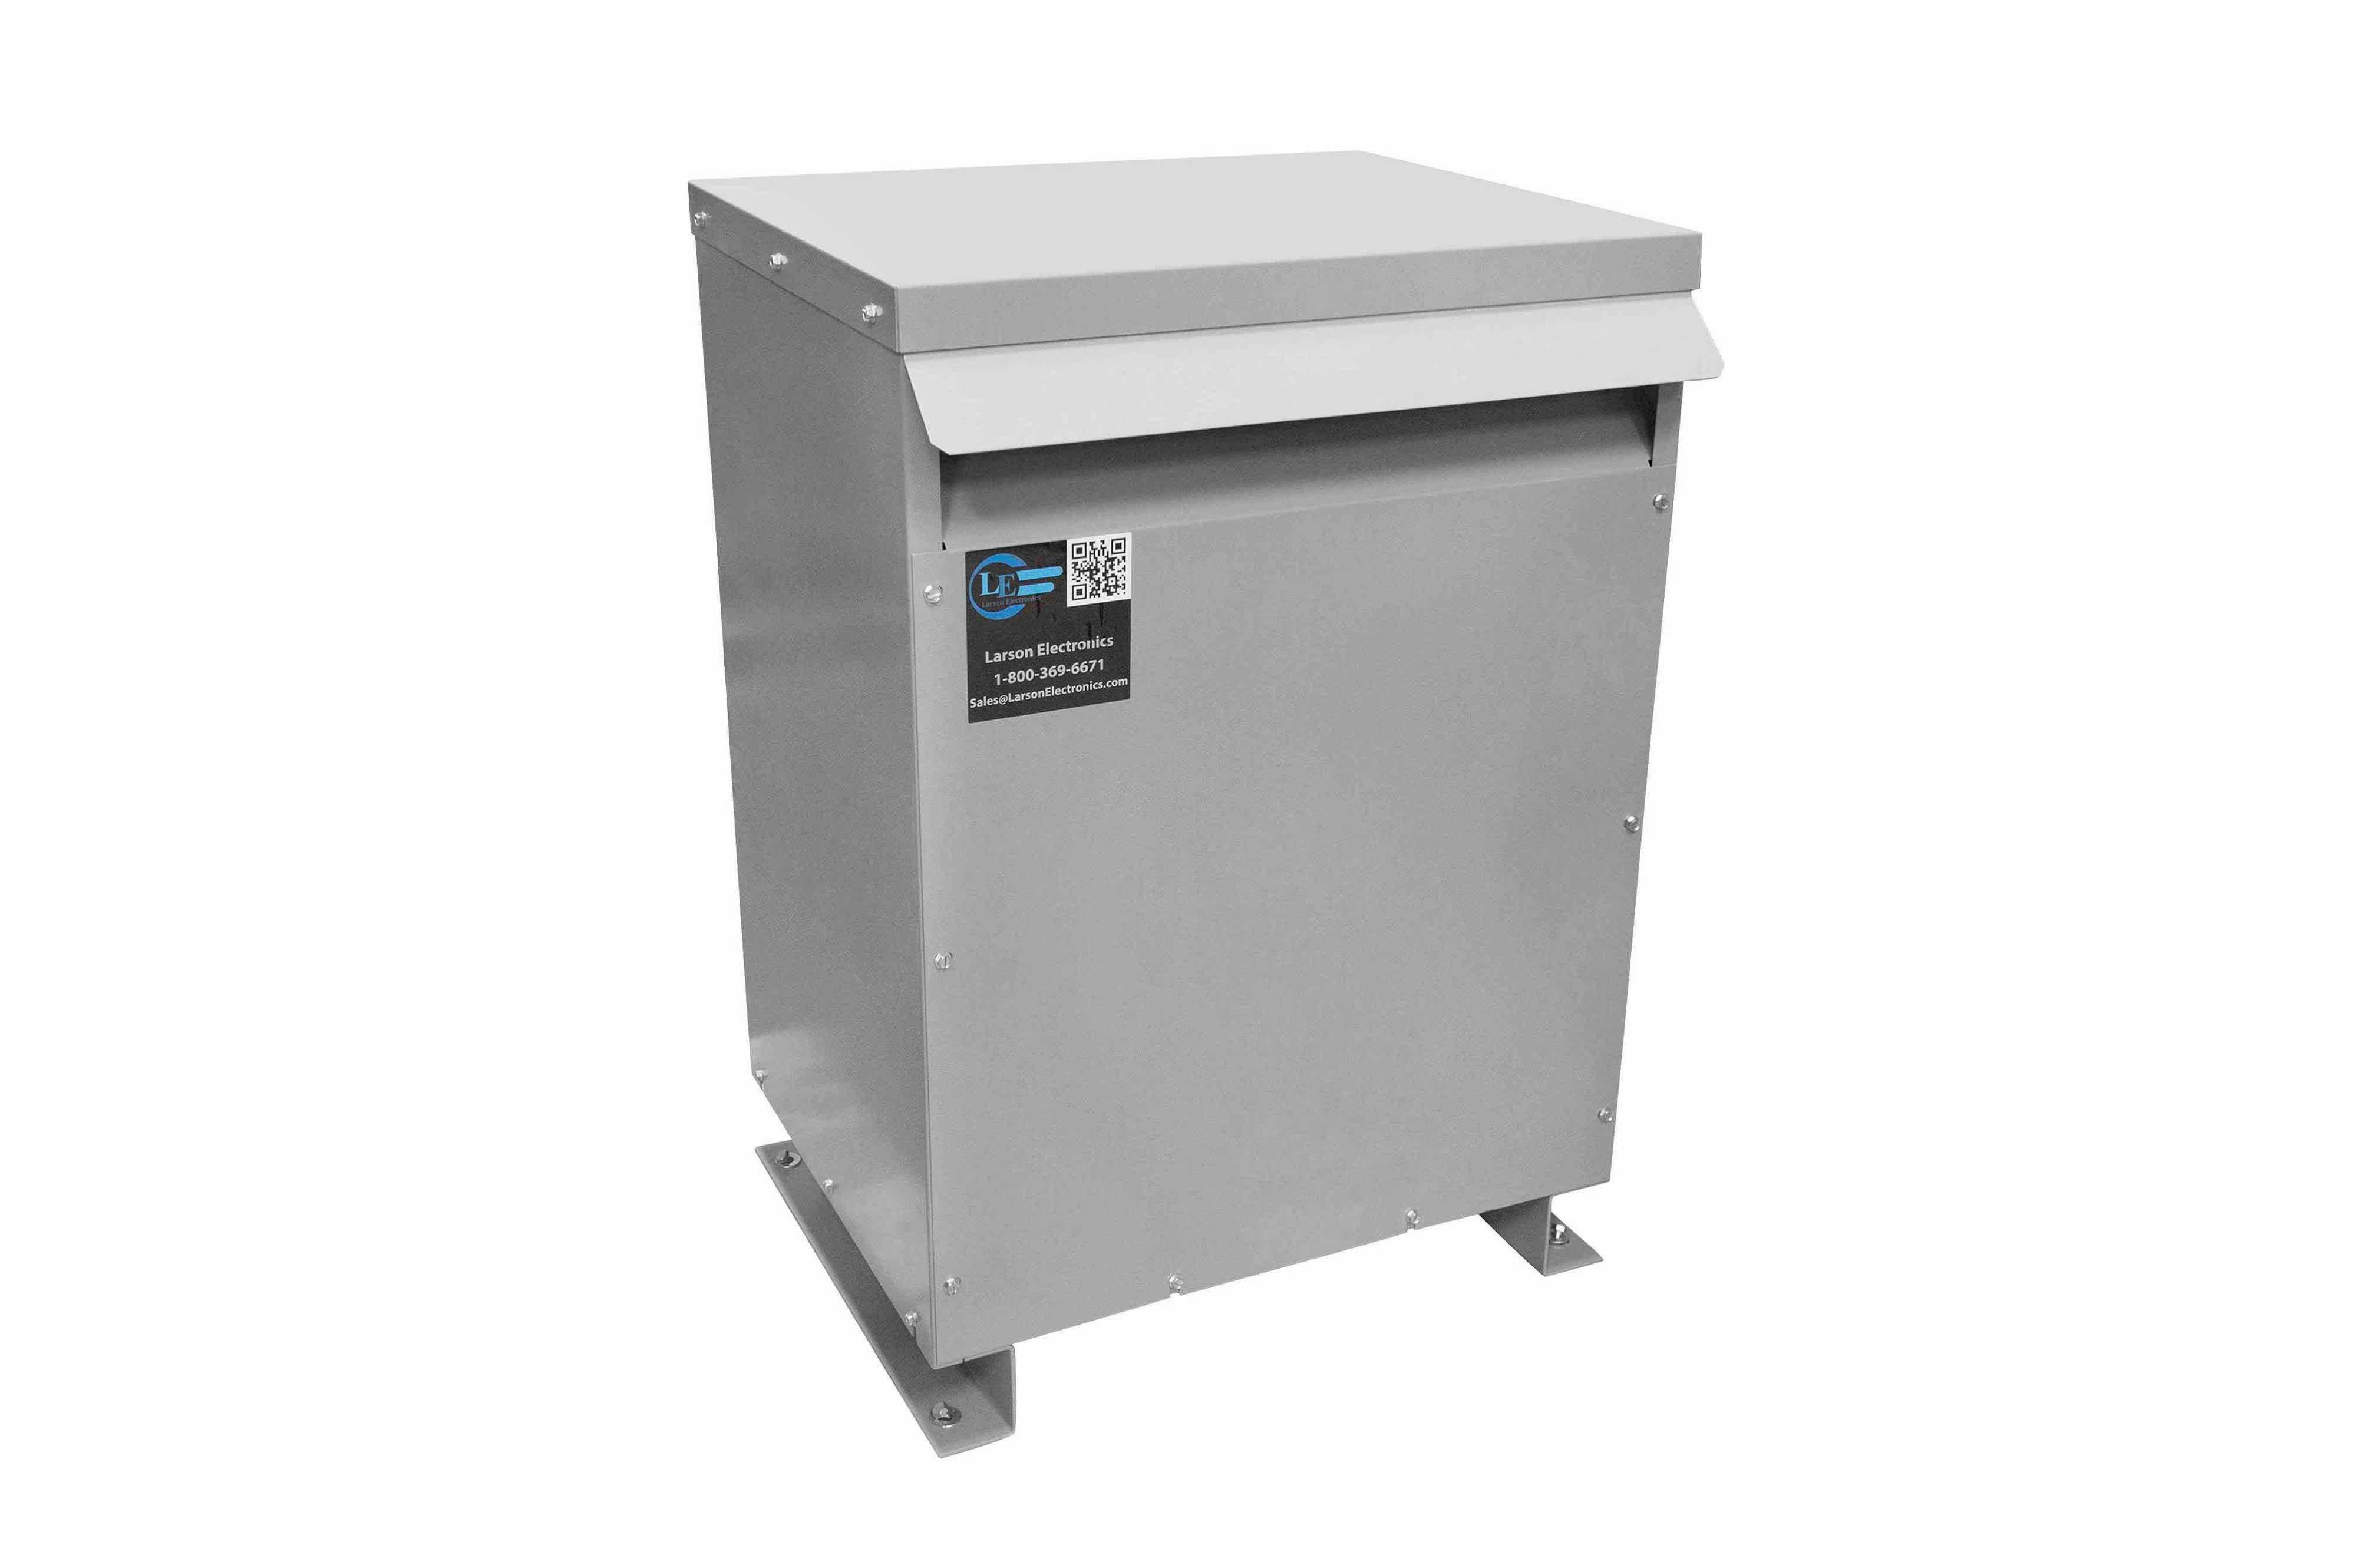 55 kVA 3PH Isolation Transformer, 600V Wye Primary, 240V/120 Delta Secondary, N3R, Ventilated, 60 Hz